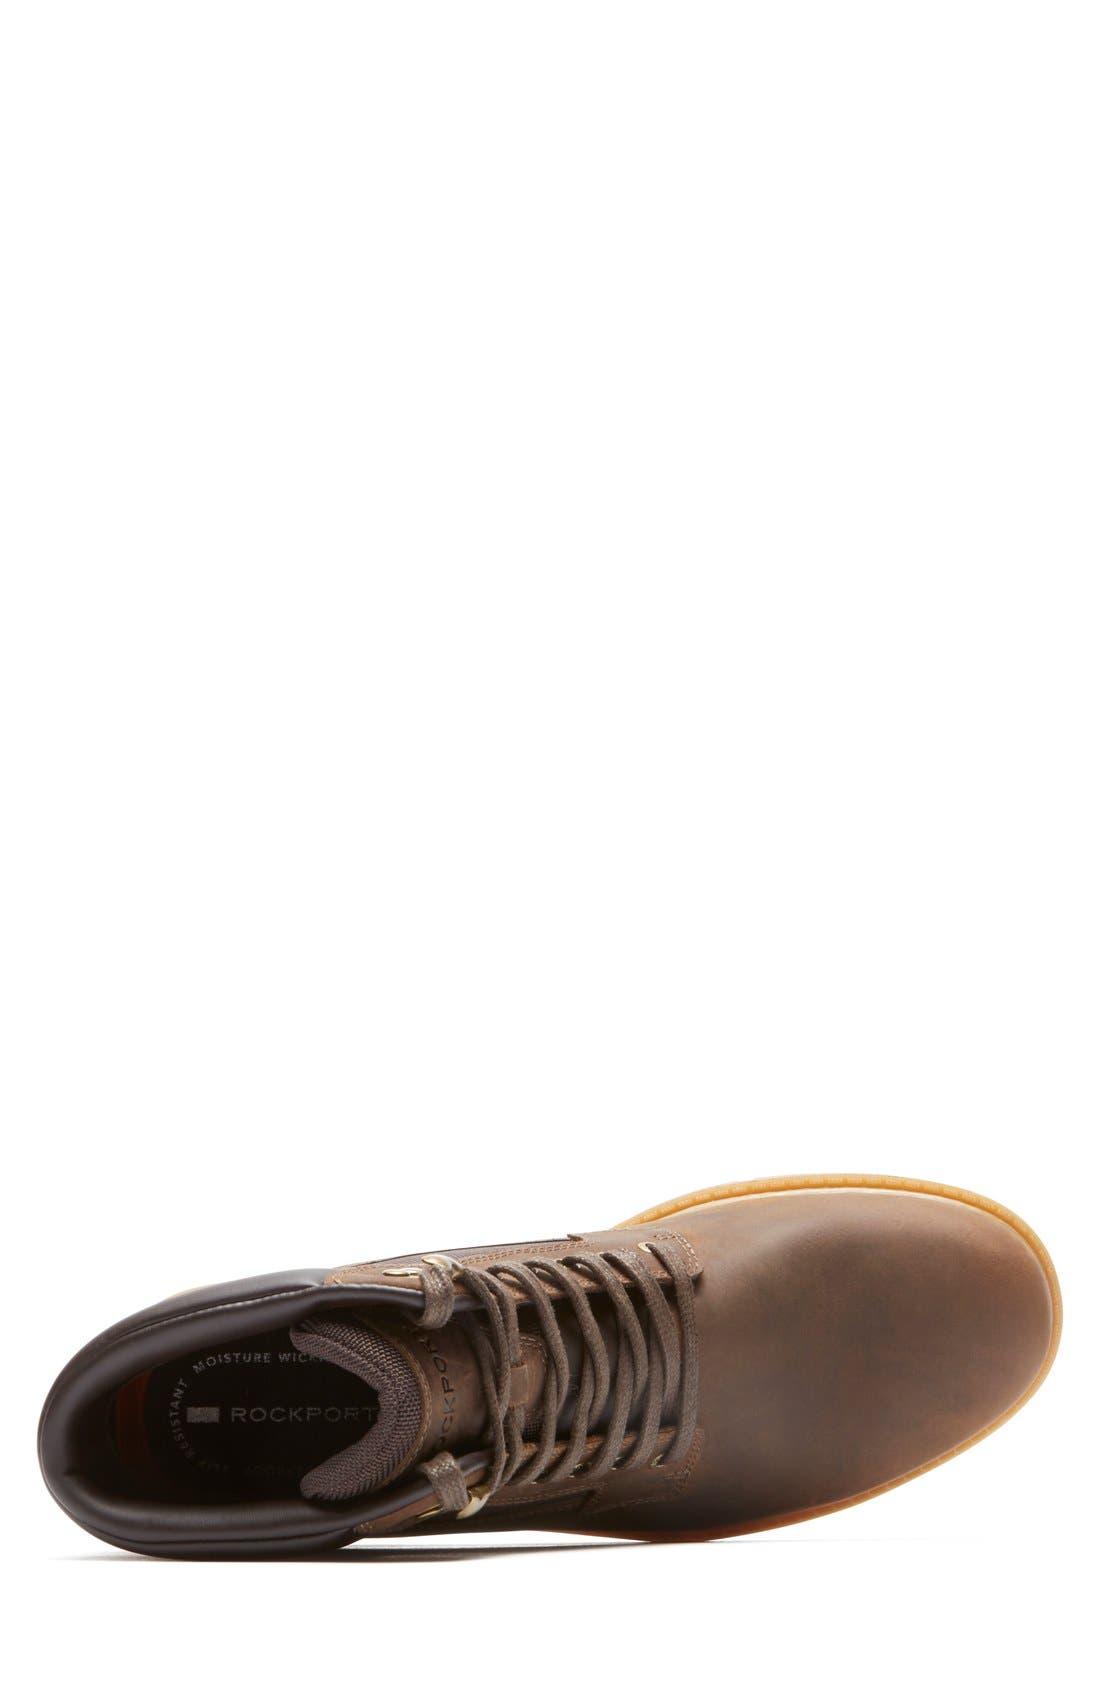 'Rugged Bucks High' Waterproof Boot,                             Alternate thumbnail 4, color,